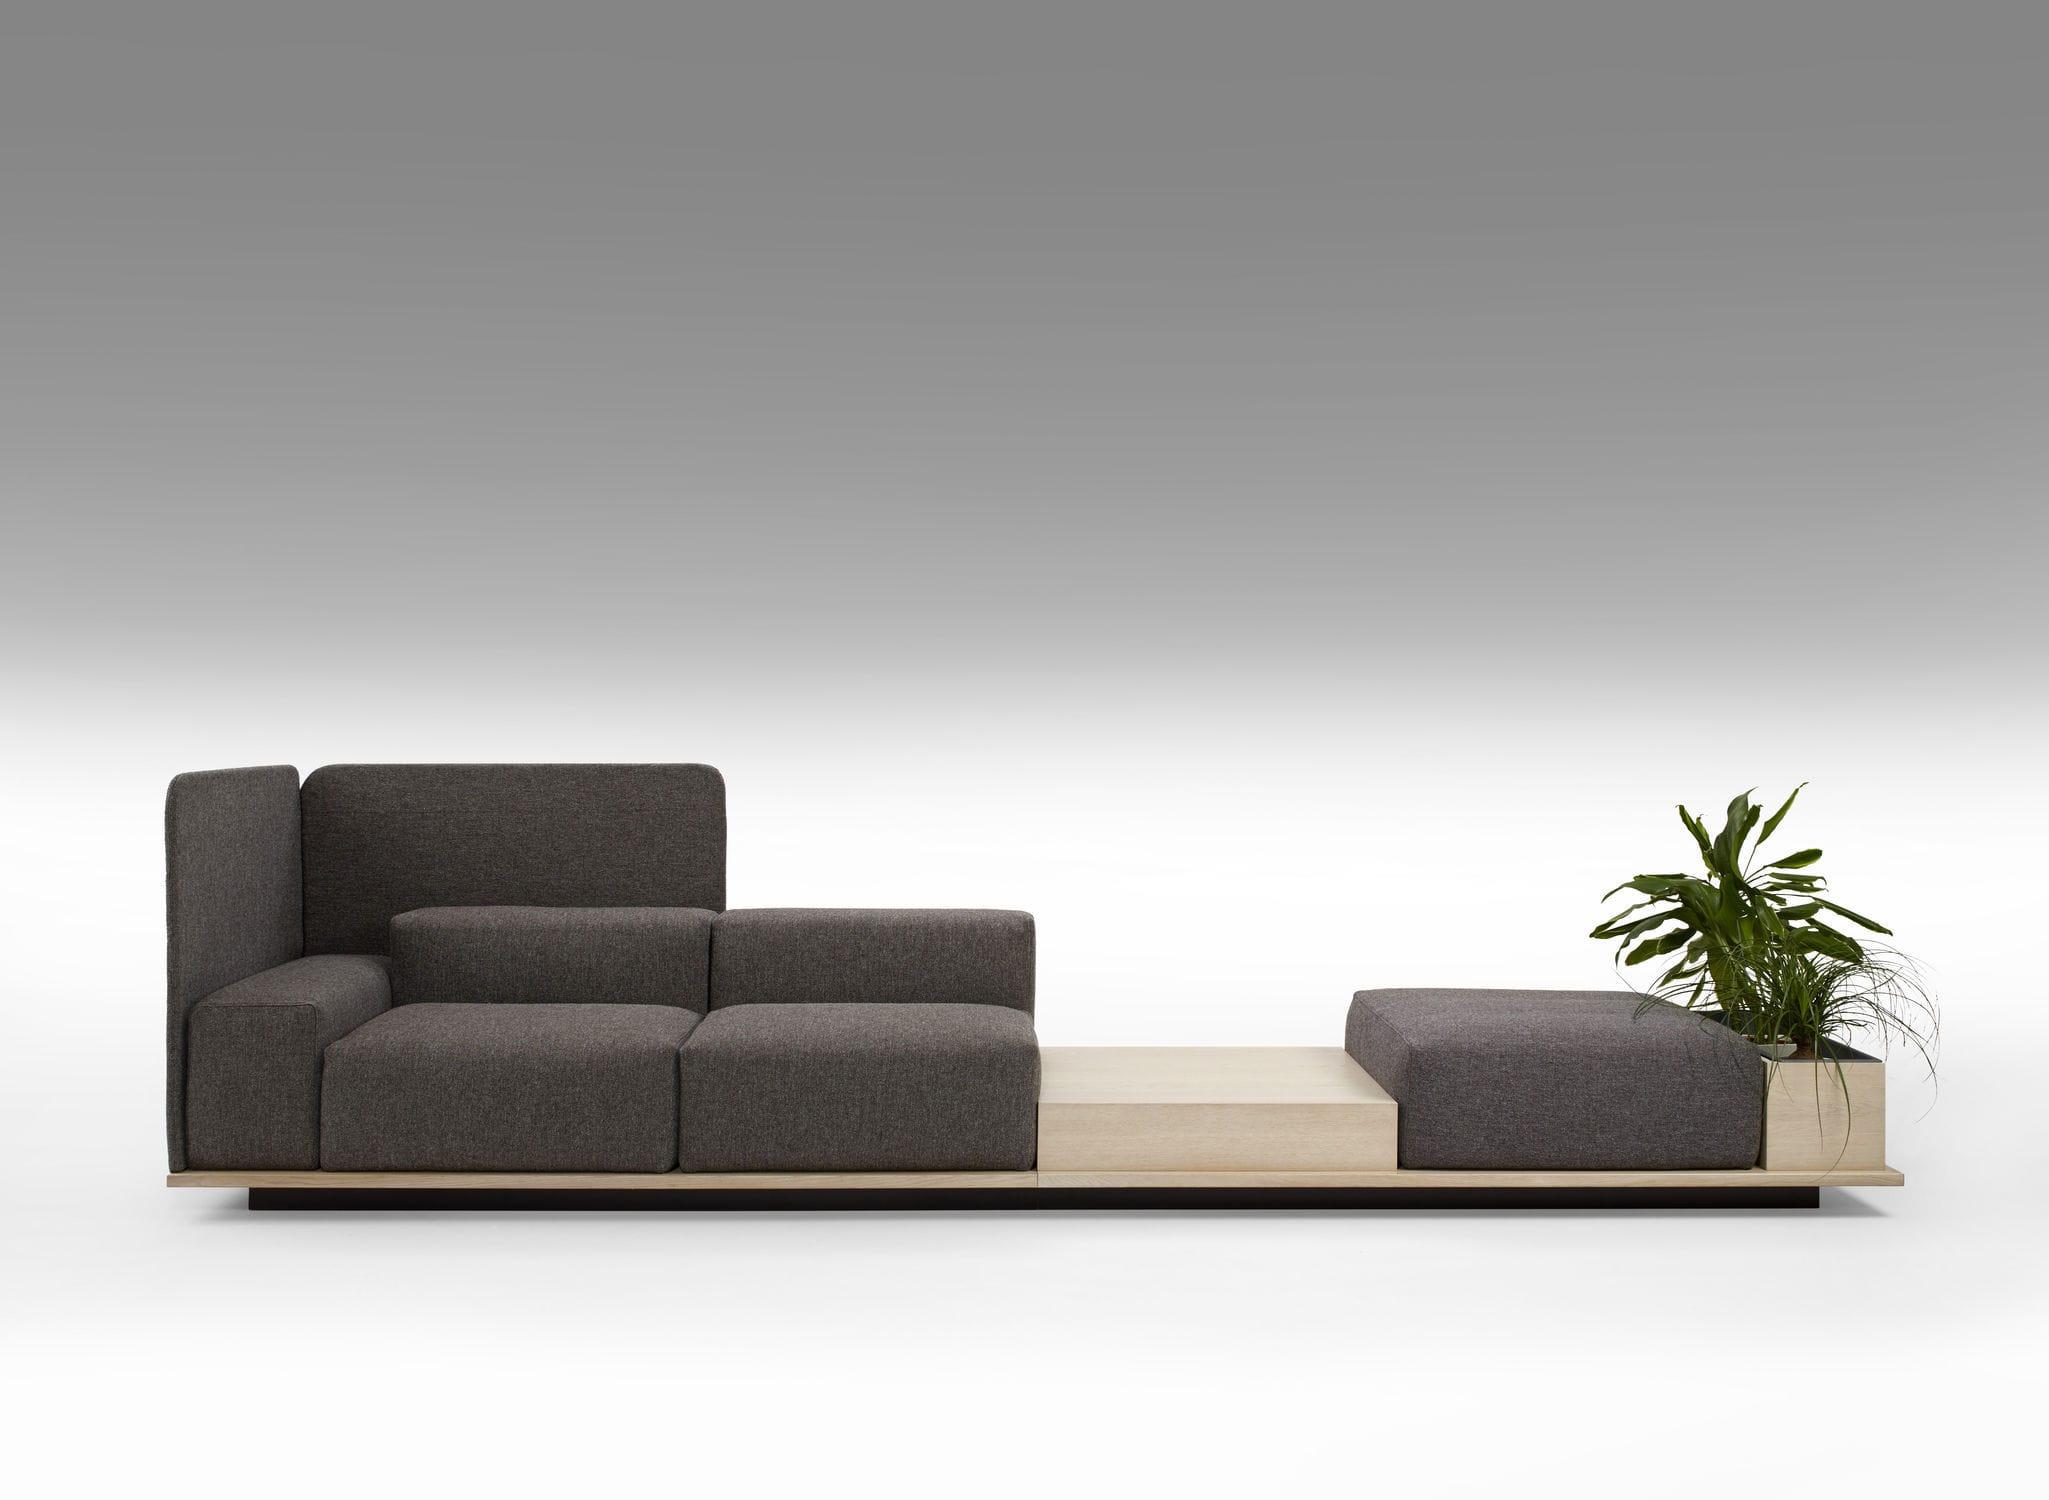 Modular Sofa / Contemporary / Leather / Wooden MEET By Fattorini, Rizzini U0026  Partners OFFECCT ...